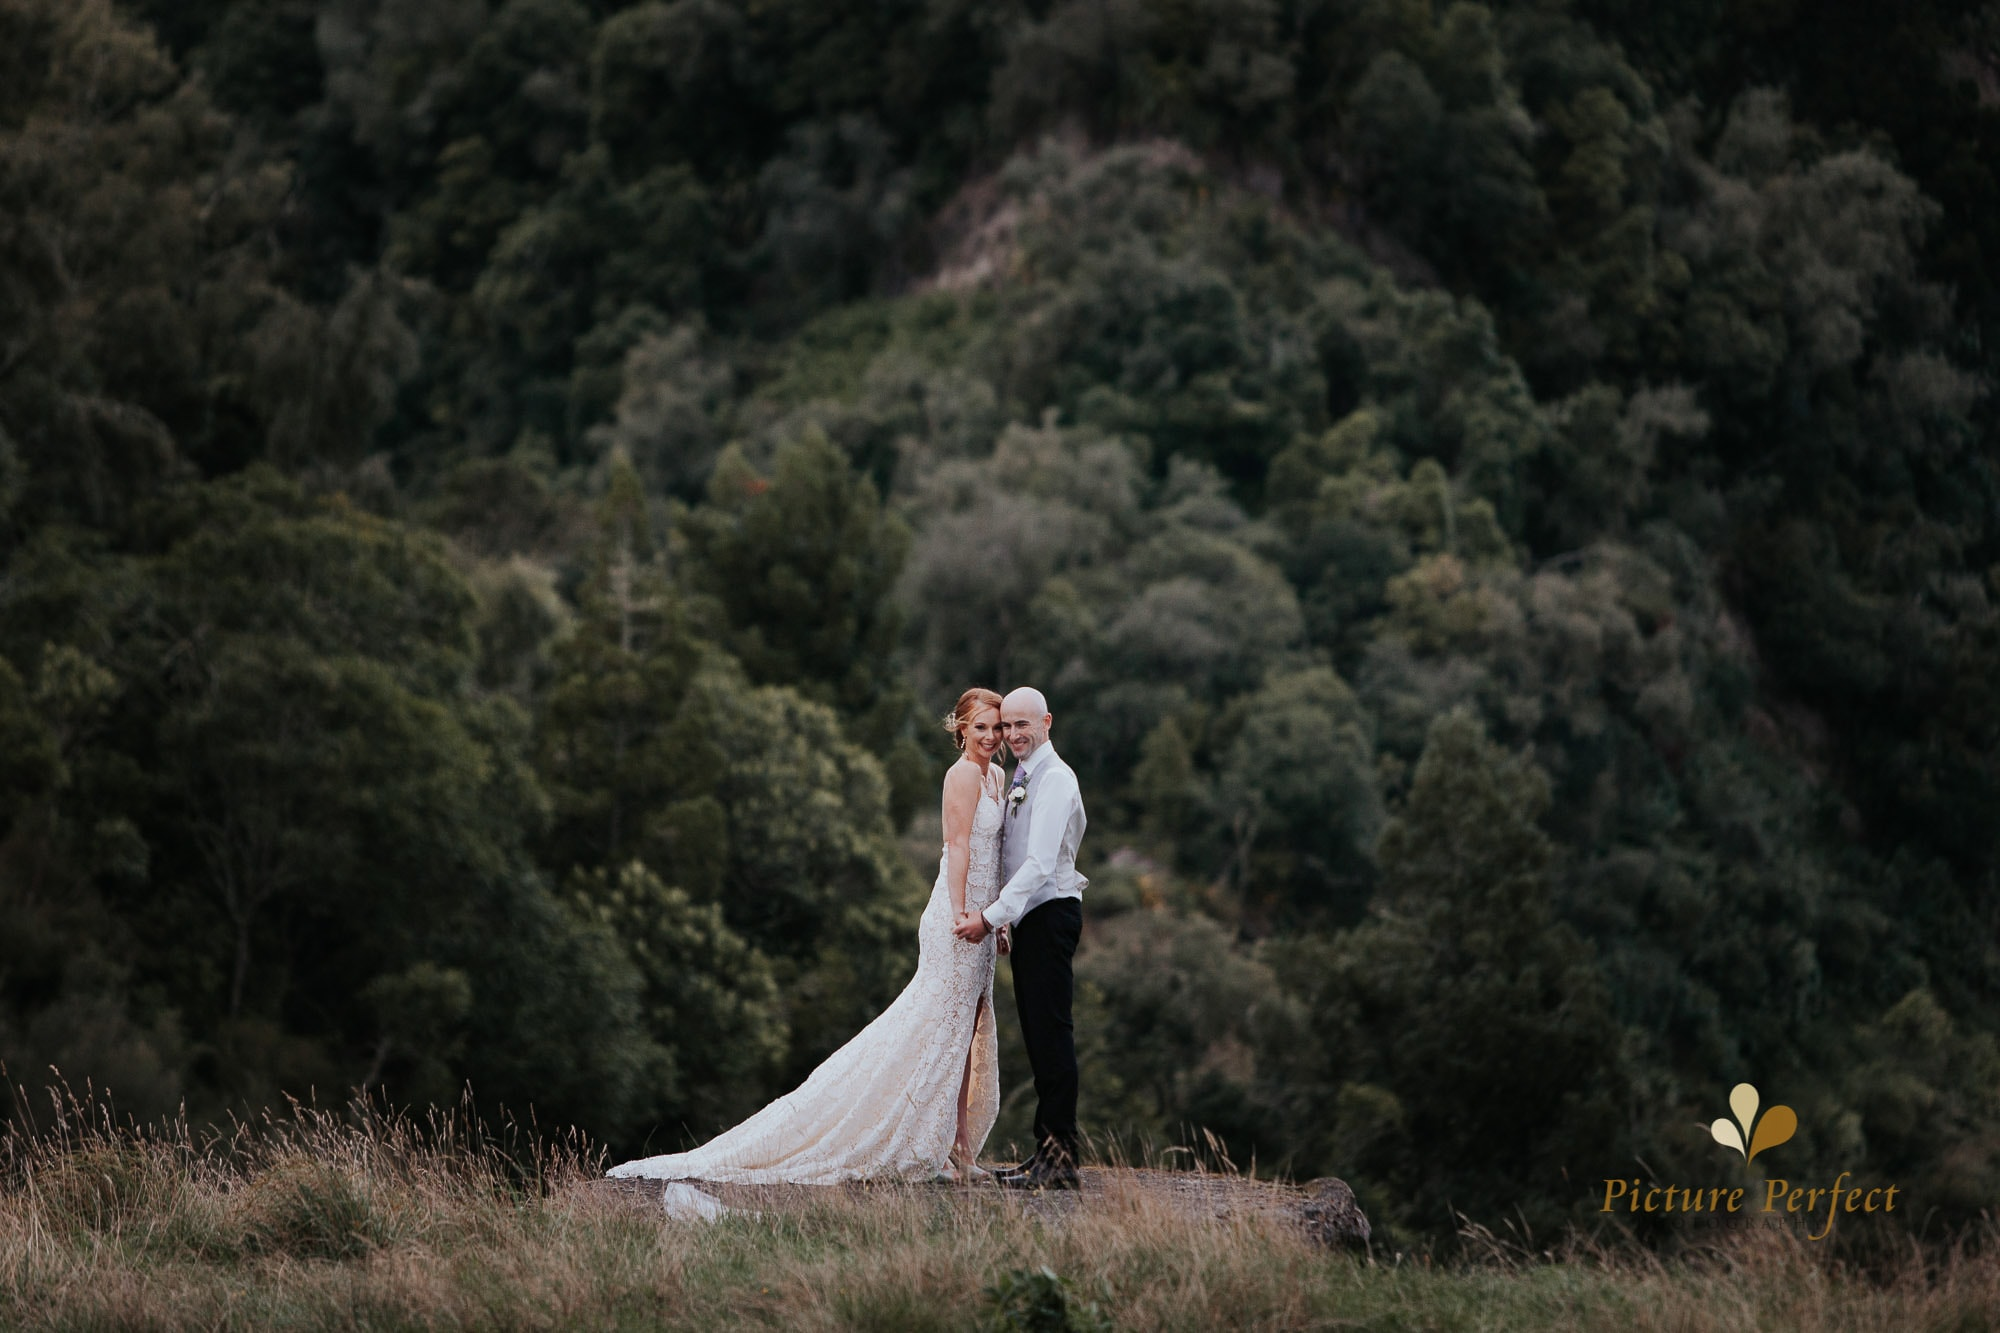 Freya and Matt fun wedding photography 0329